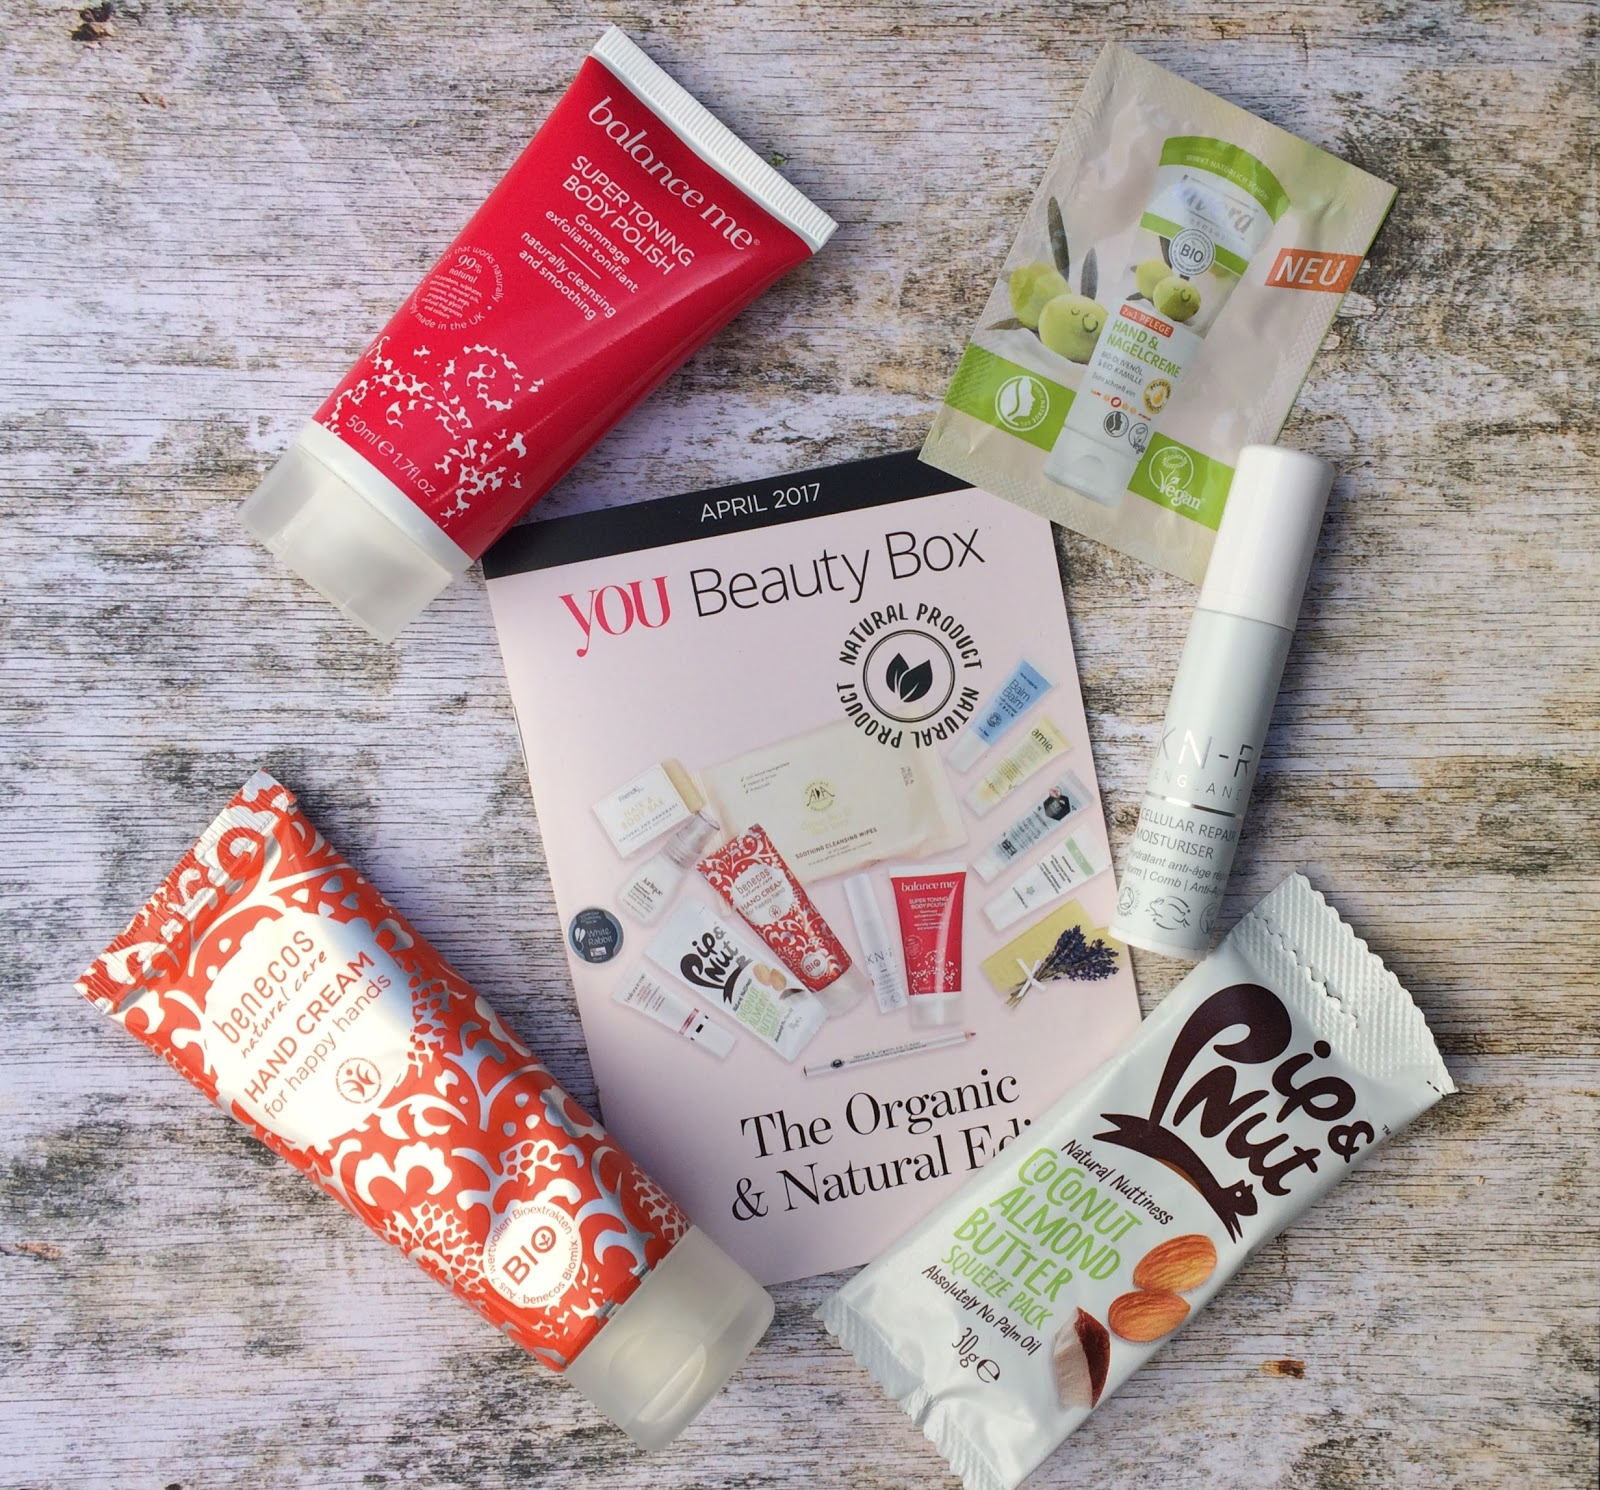 April 2017 You Beauty Box contents